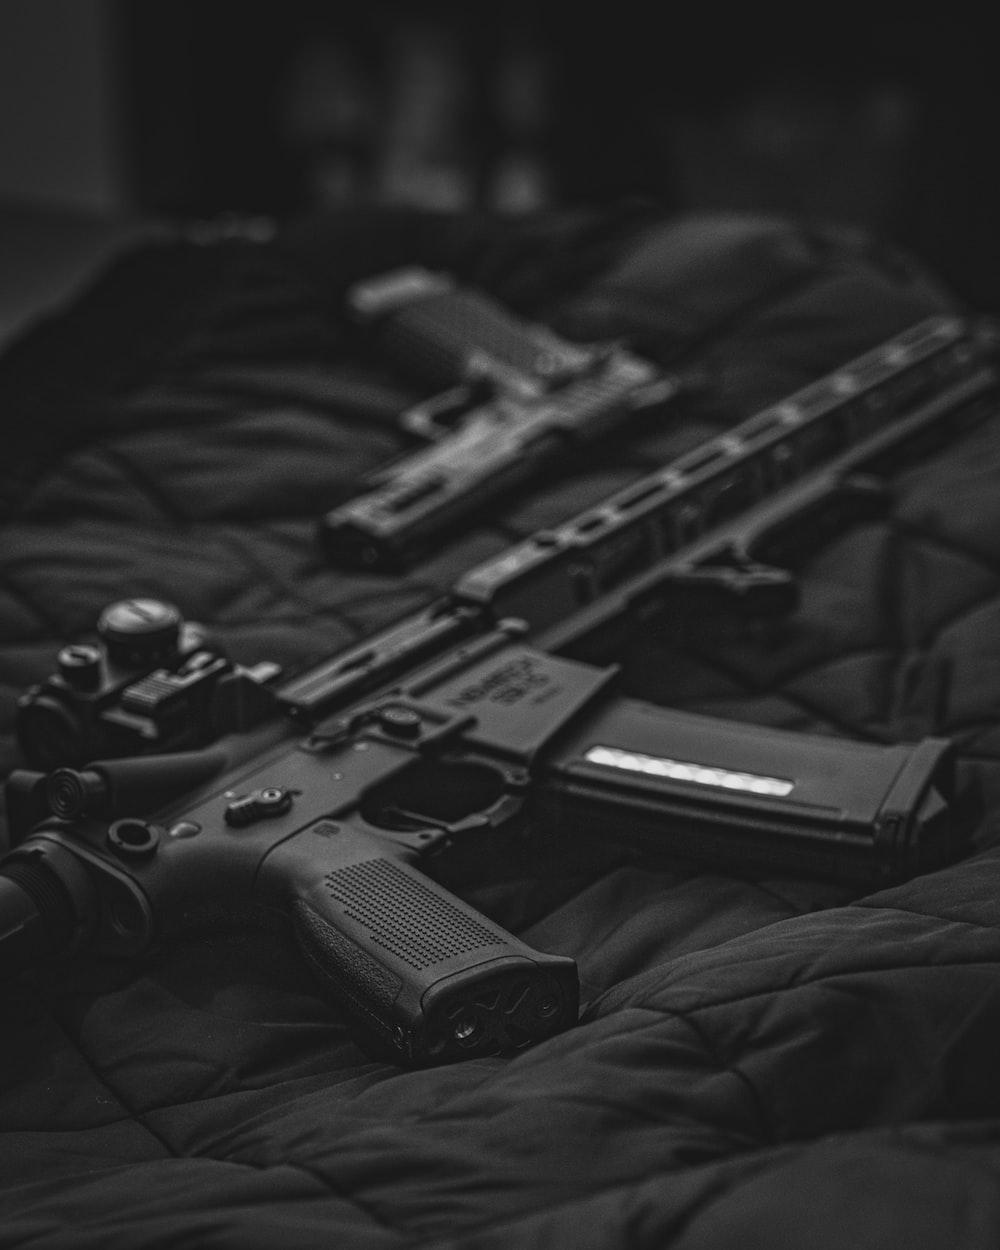 black semi automatic pistol on black textile